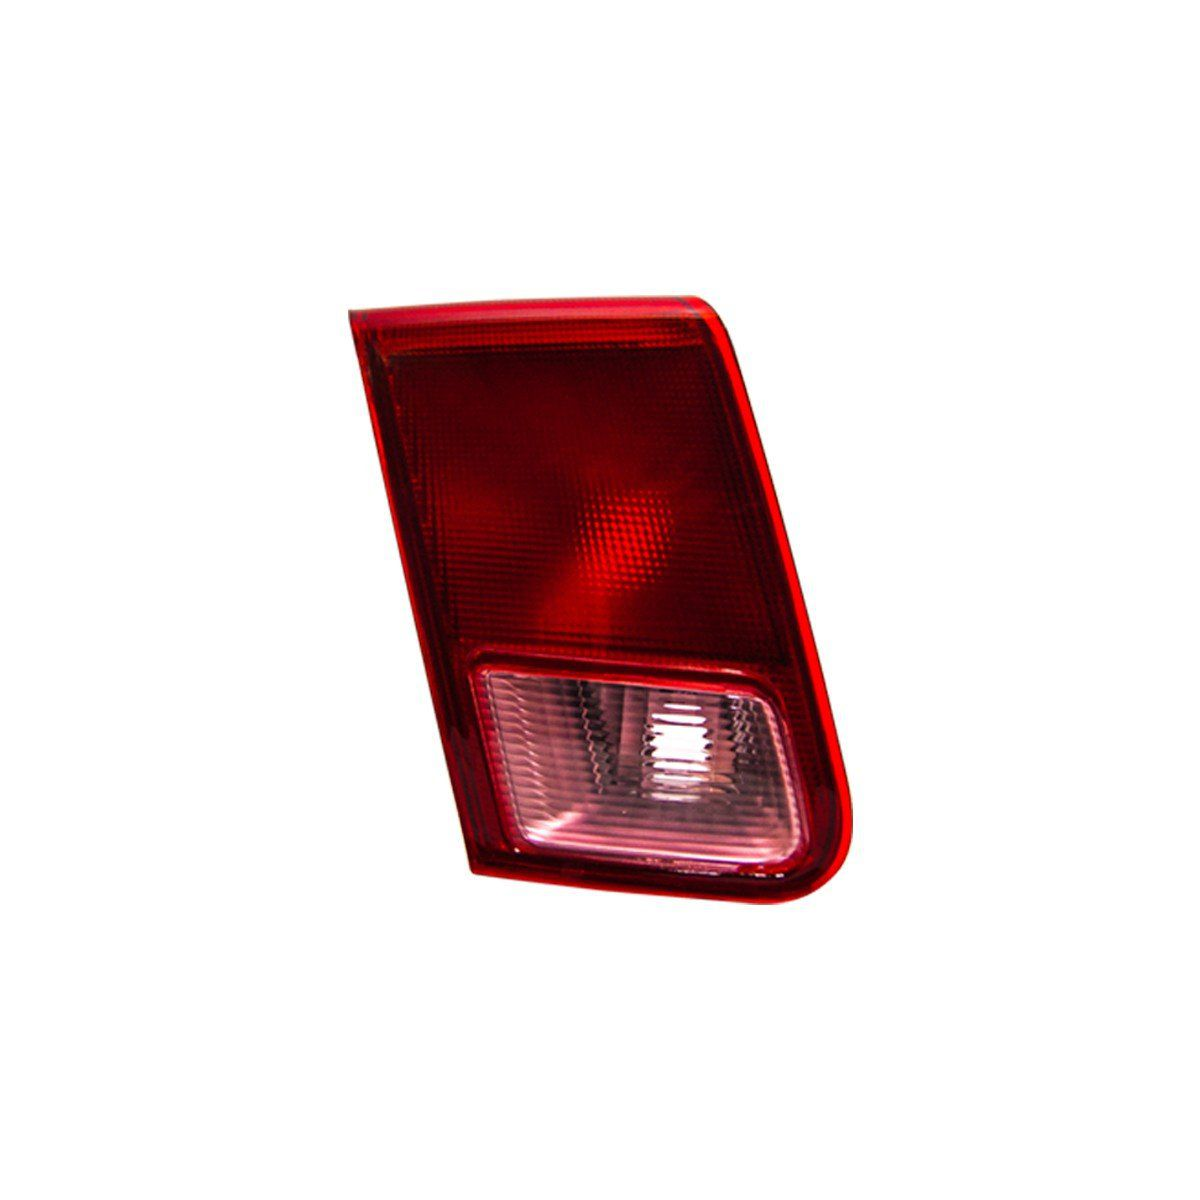 Lanterna Porta Malas Civic 2000 2002 2003 2004 2005 2006